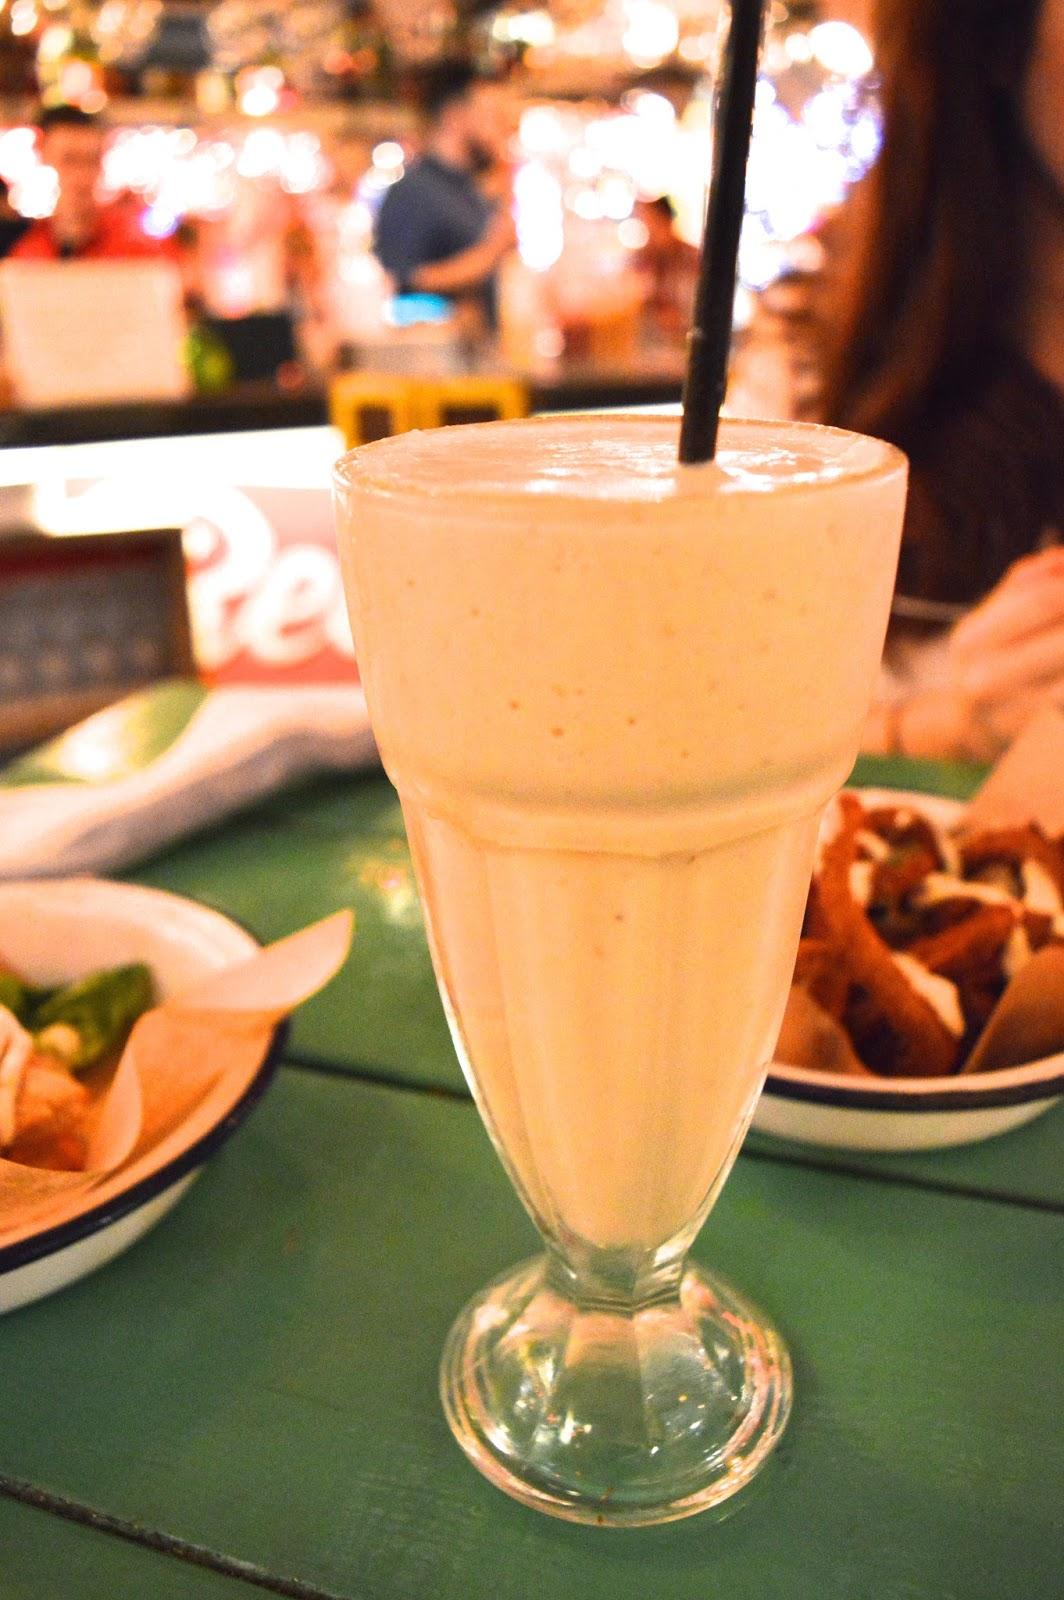 Turtle Bay Southampton review, food bloggers, UK food bloggers, Hampshire bloggers, places to eat Southampton, Caribbean food